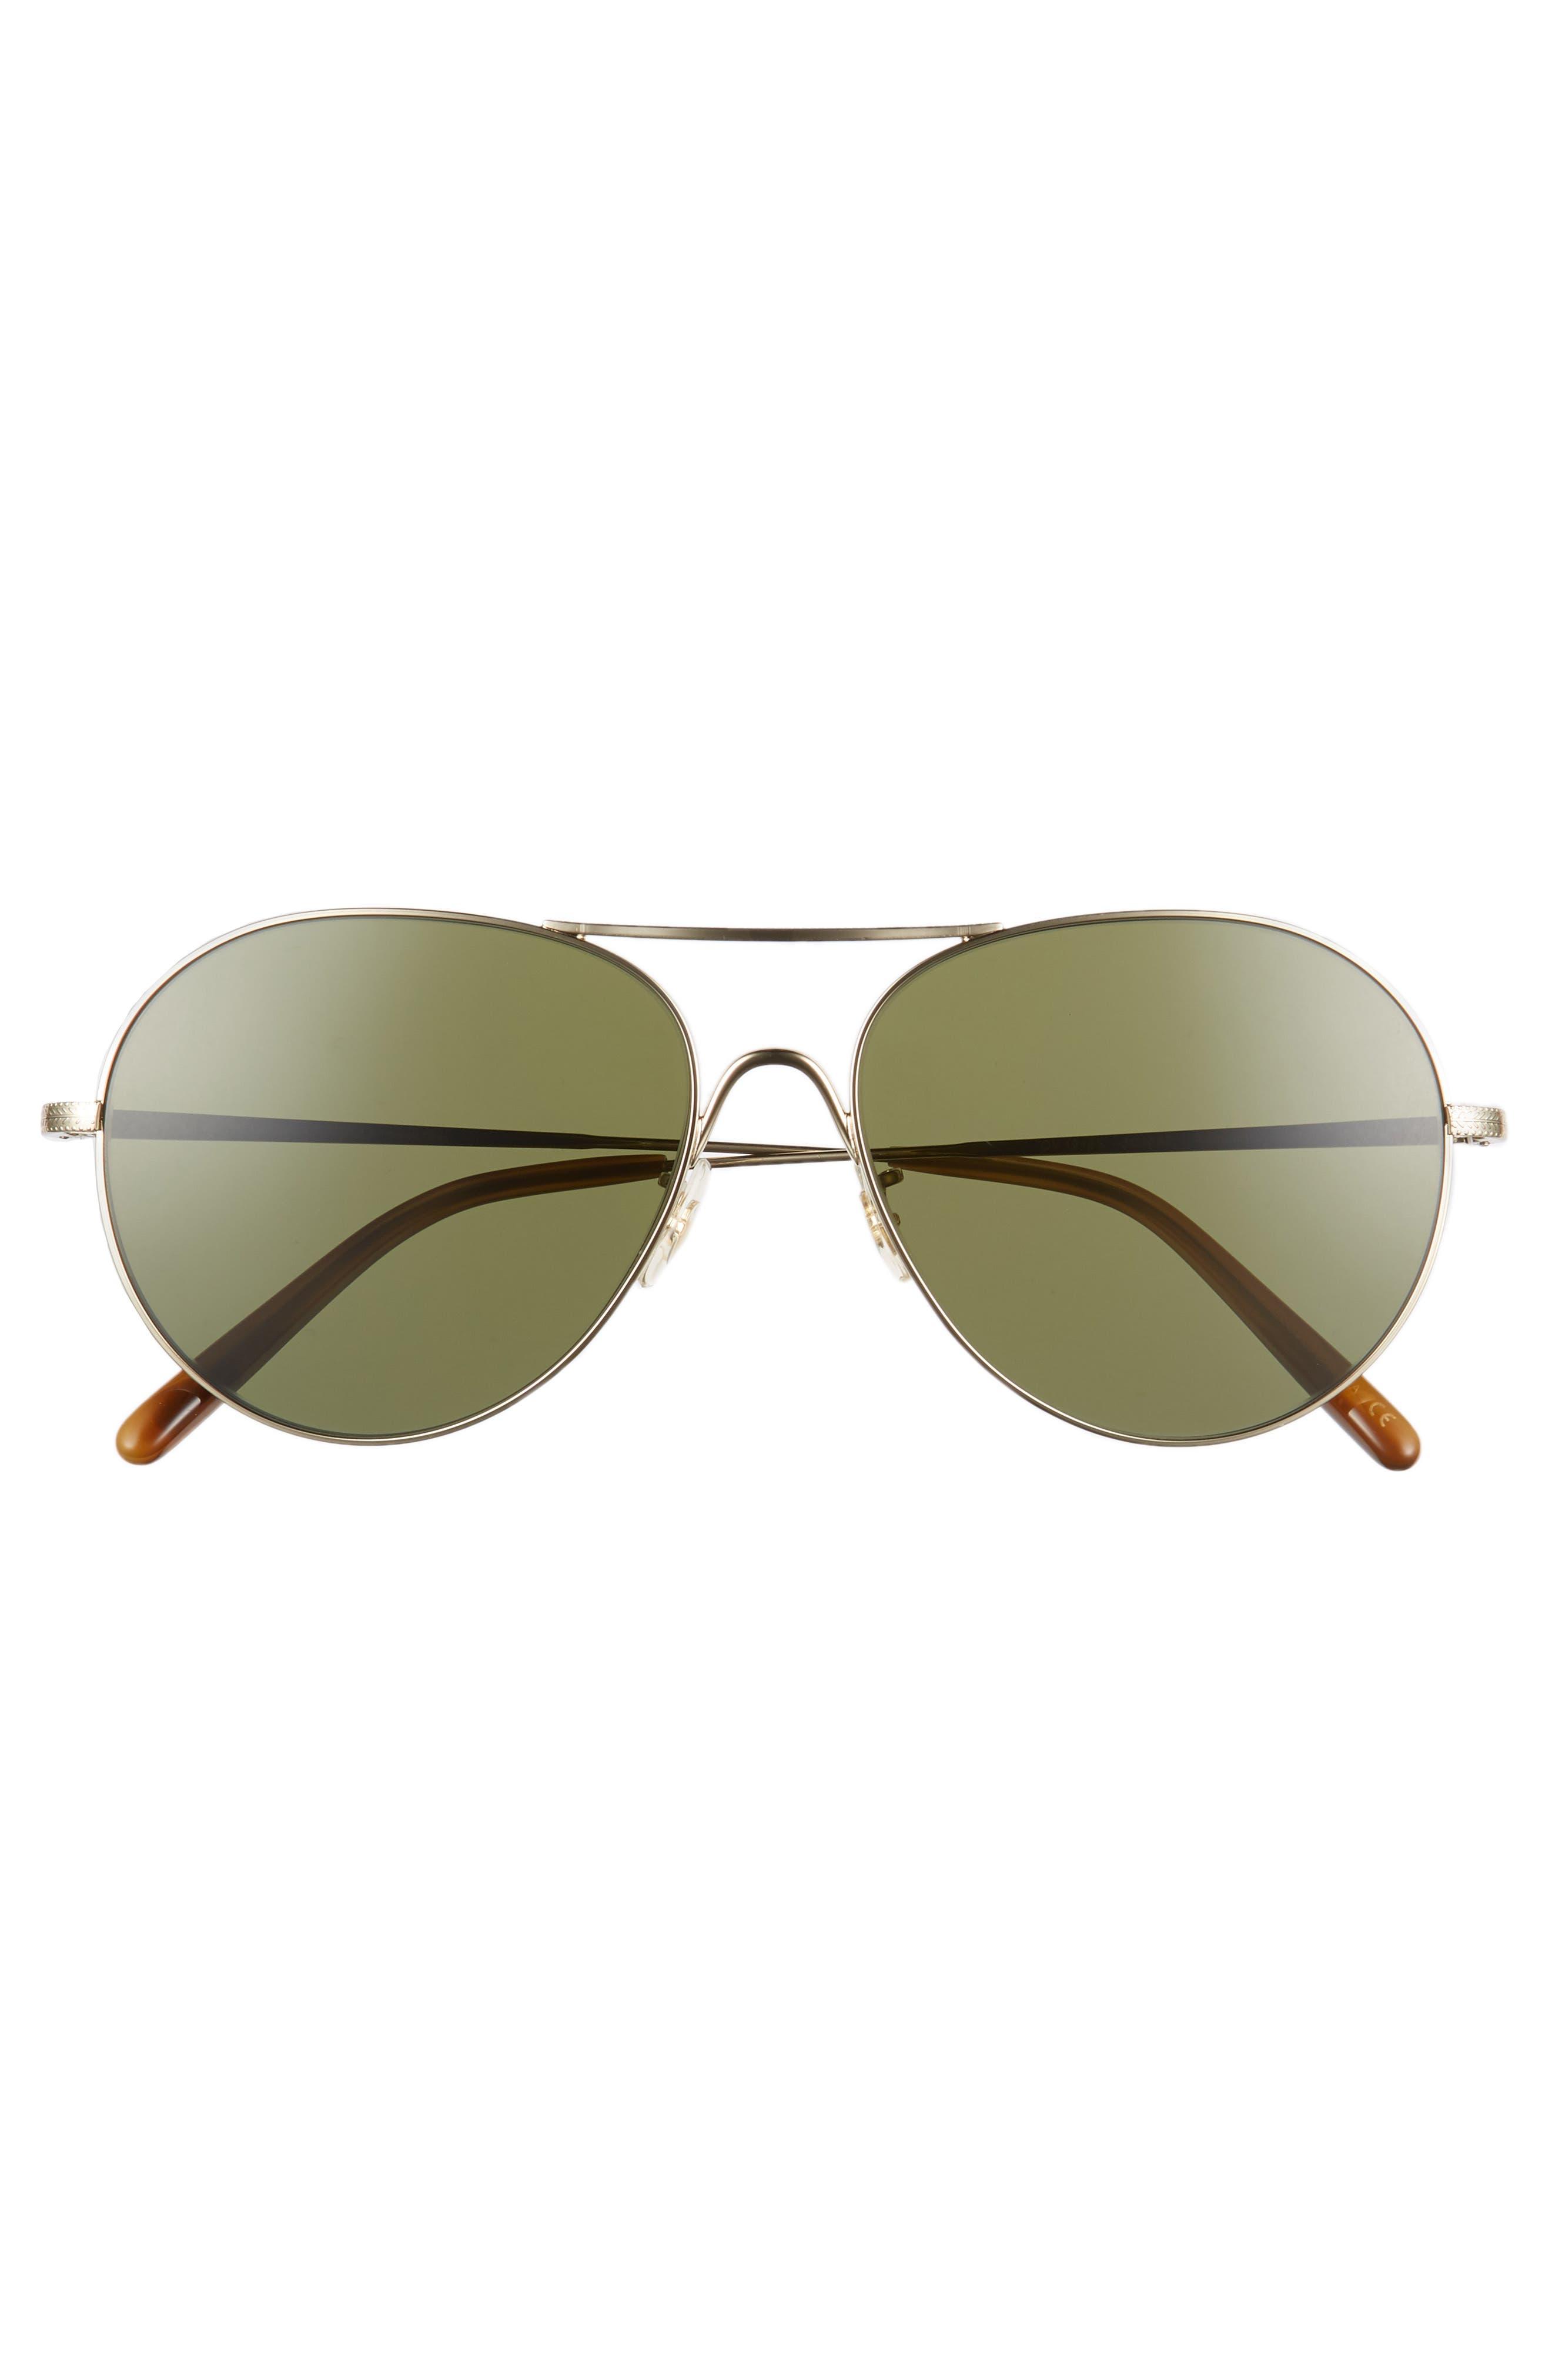 Rockmore 58mm Aviator Sunglasses,                             Alternate thumbnail 3, color,                             Gold/ Green